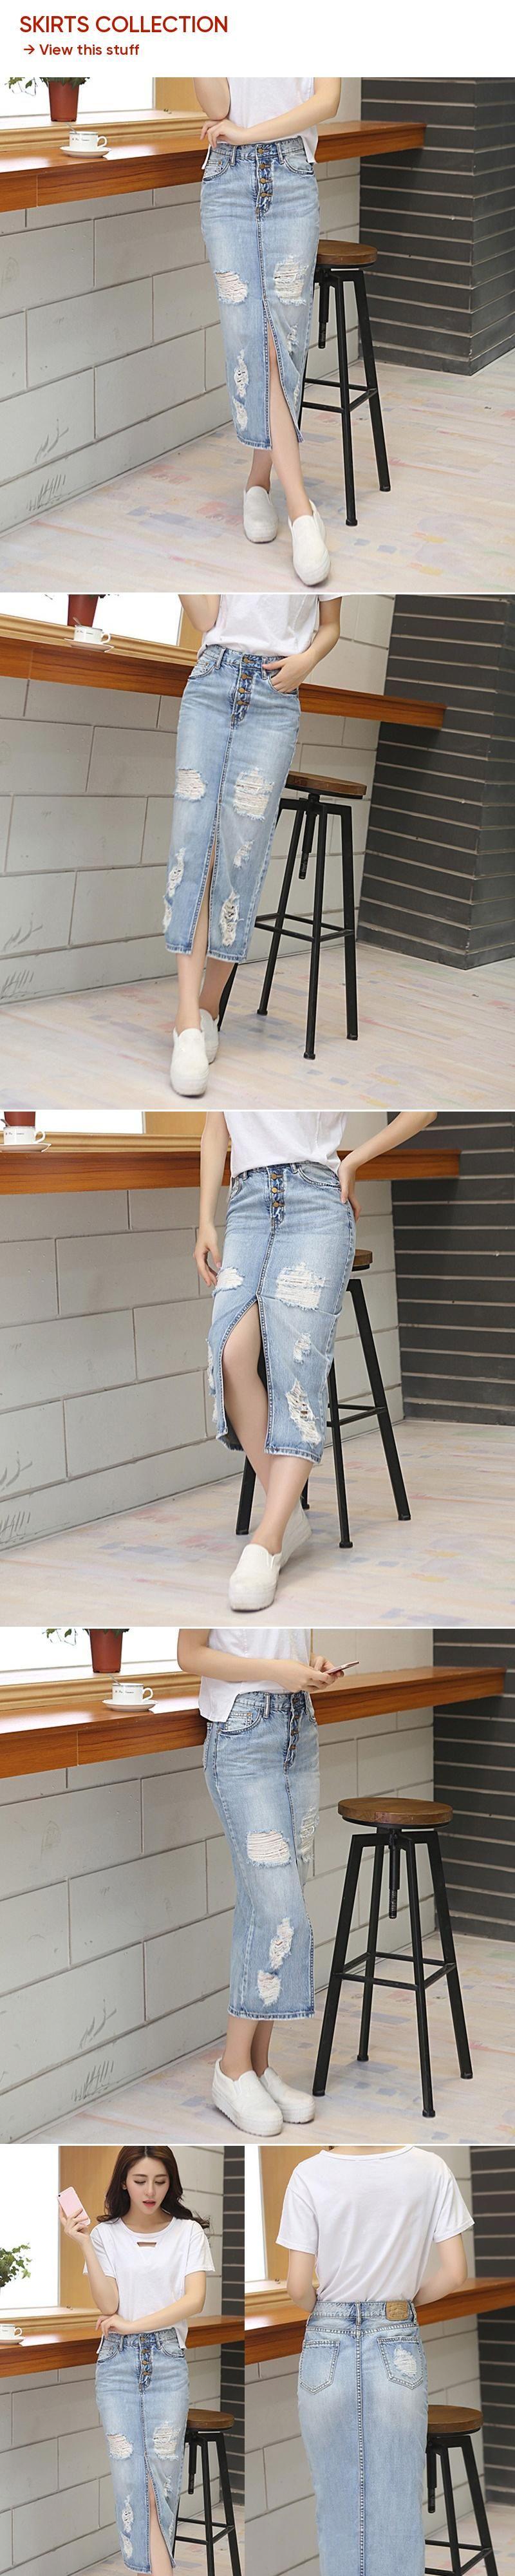 4c3803acf 2018 Summer Autumn Women Slim Long Denim Skirt Casual Hole Maxi Jean Skirt  Vintage High waist Hem Split Pencil Skirts Streetwear